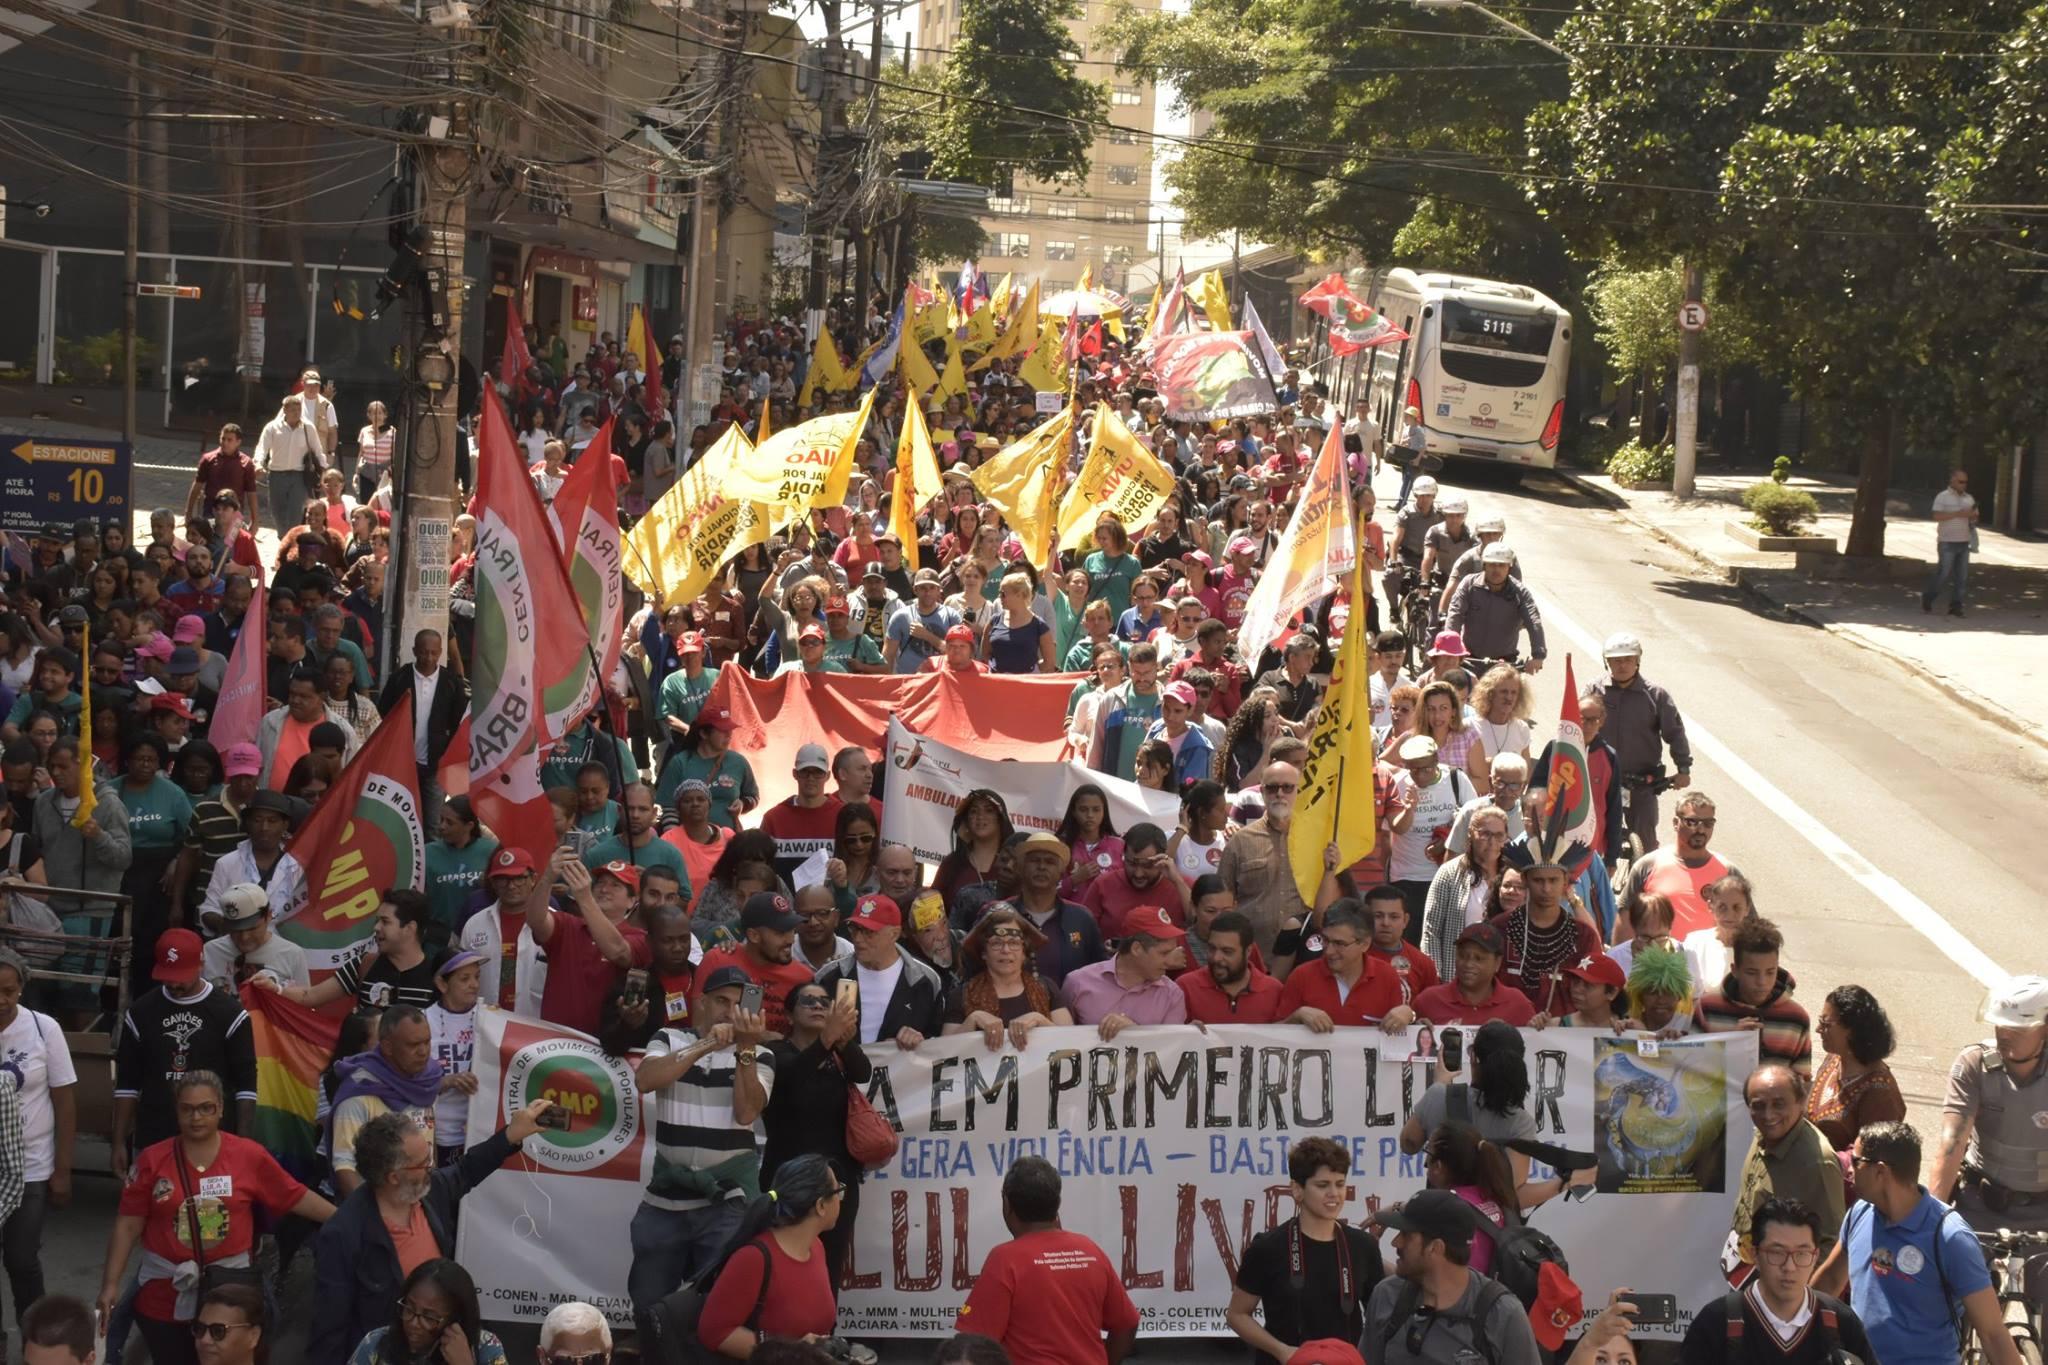 FOTO10-Jornalistas Livres